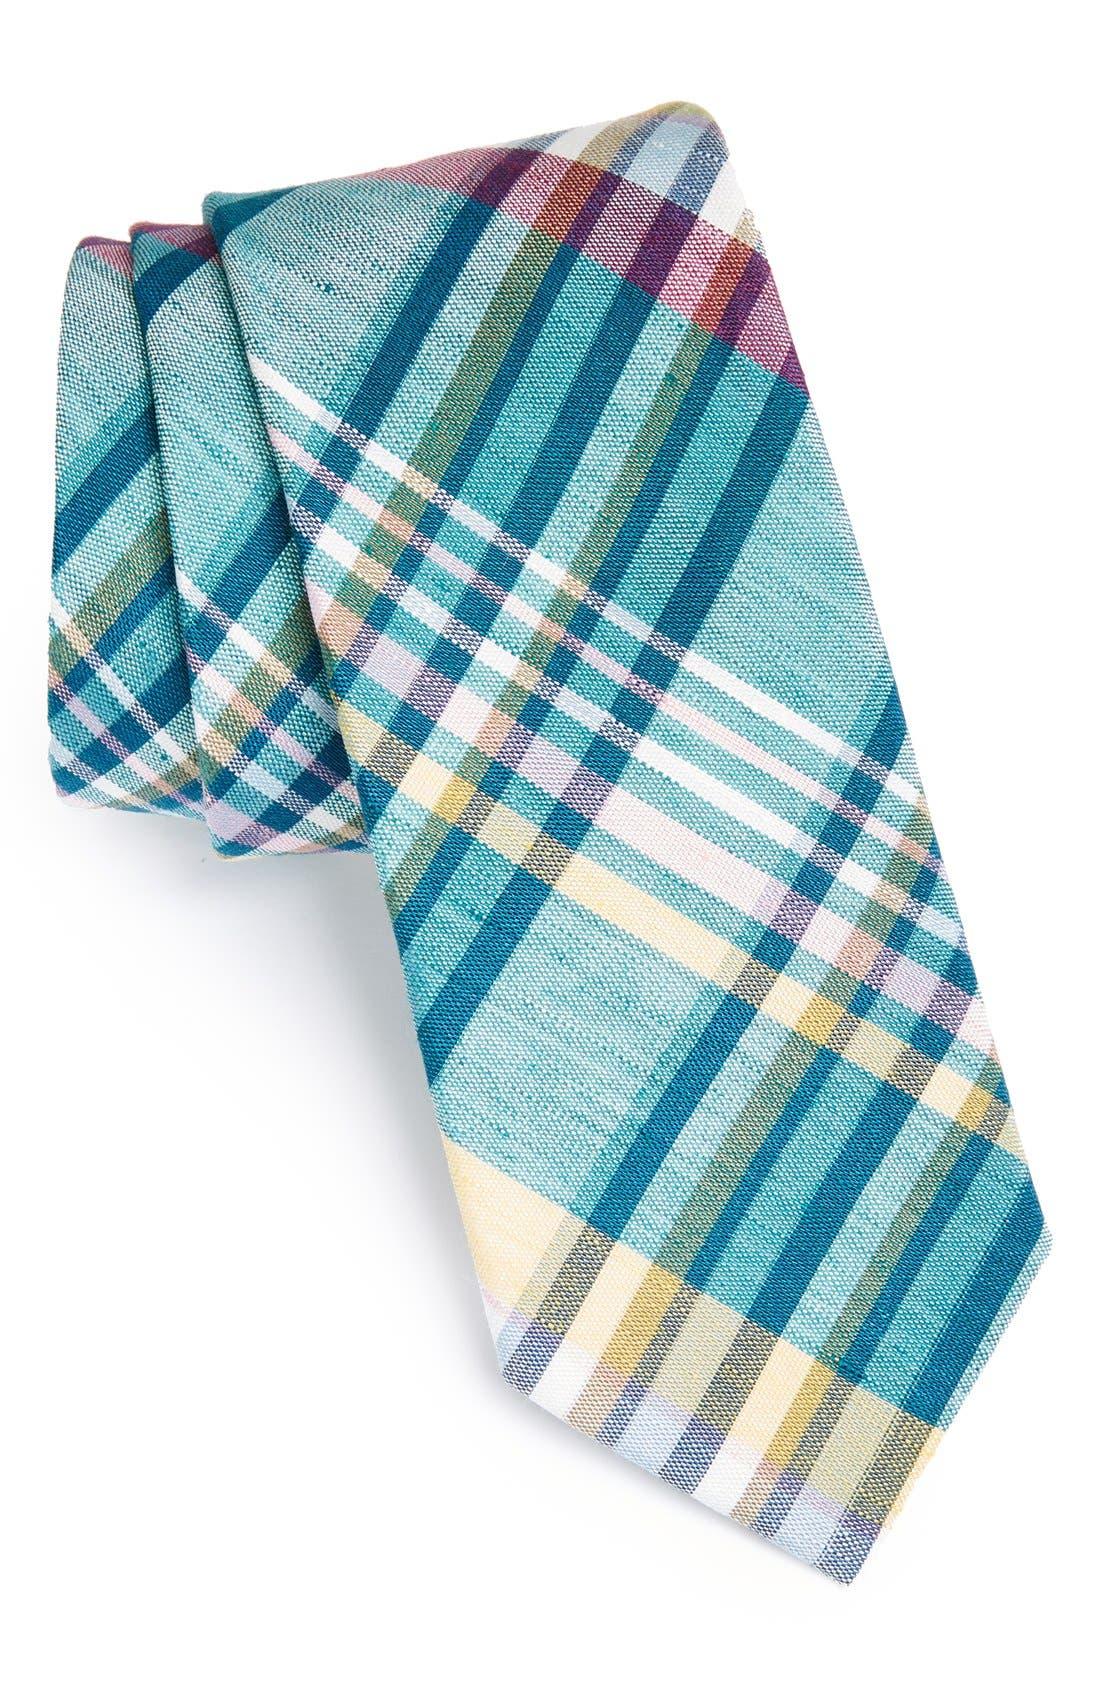 Main Image - 1901 Woven Linen & Silk Tie